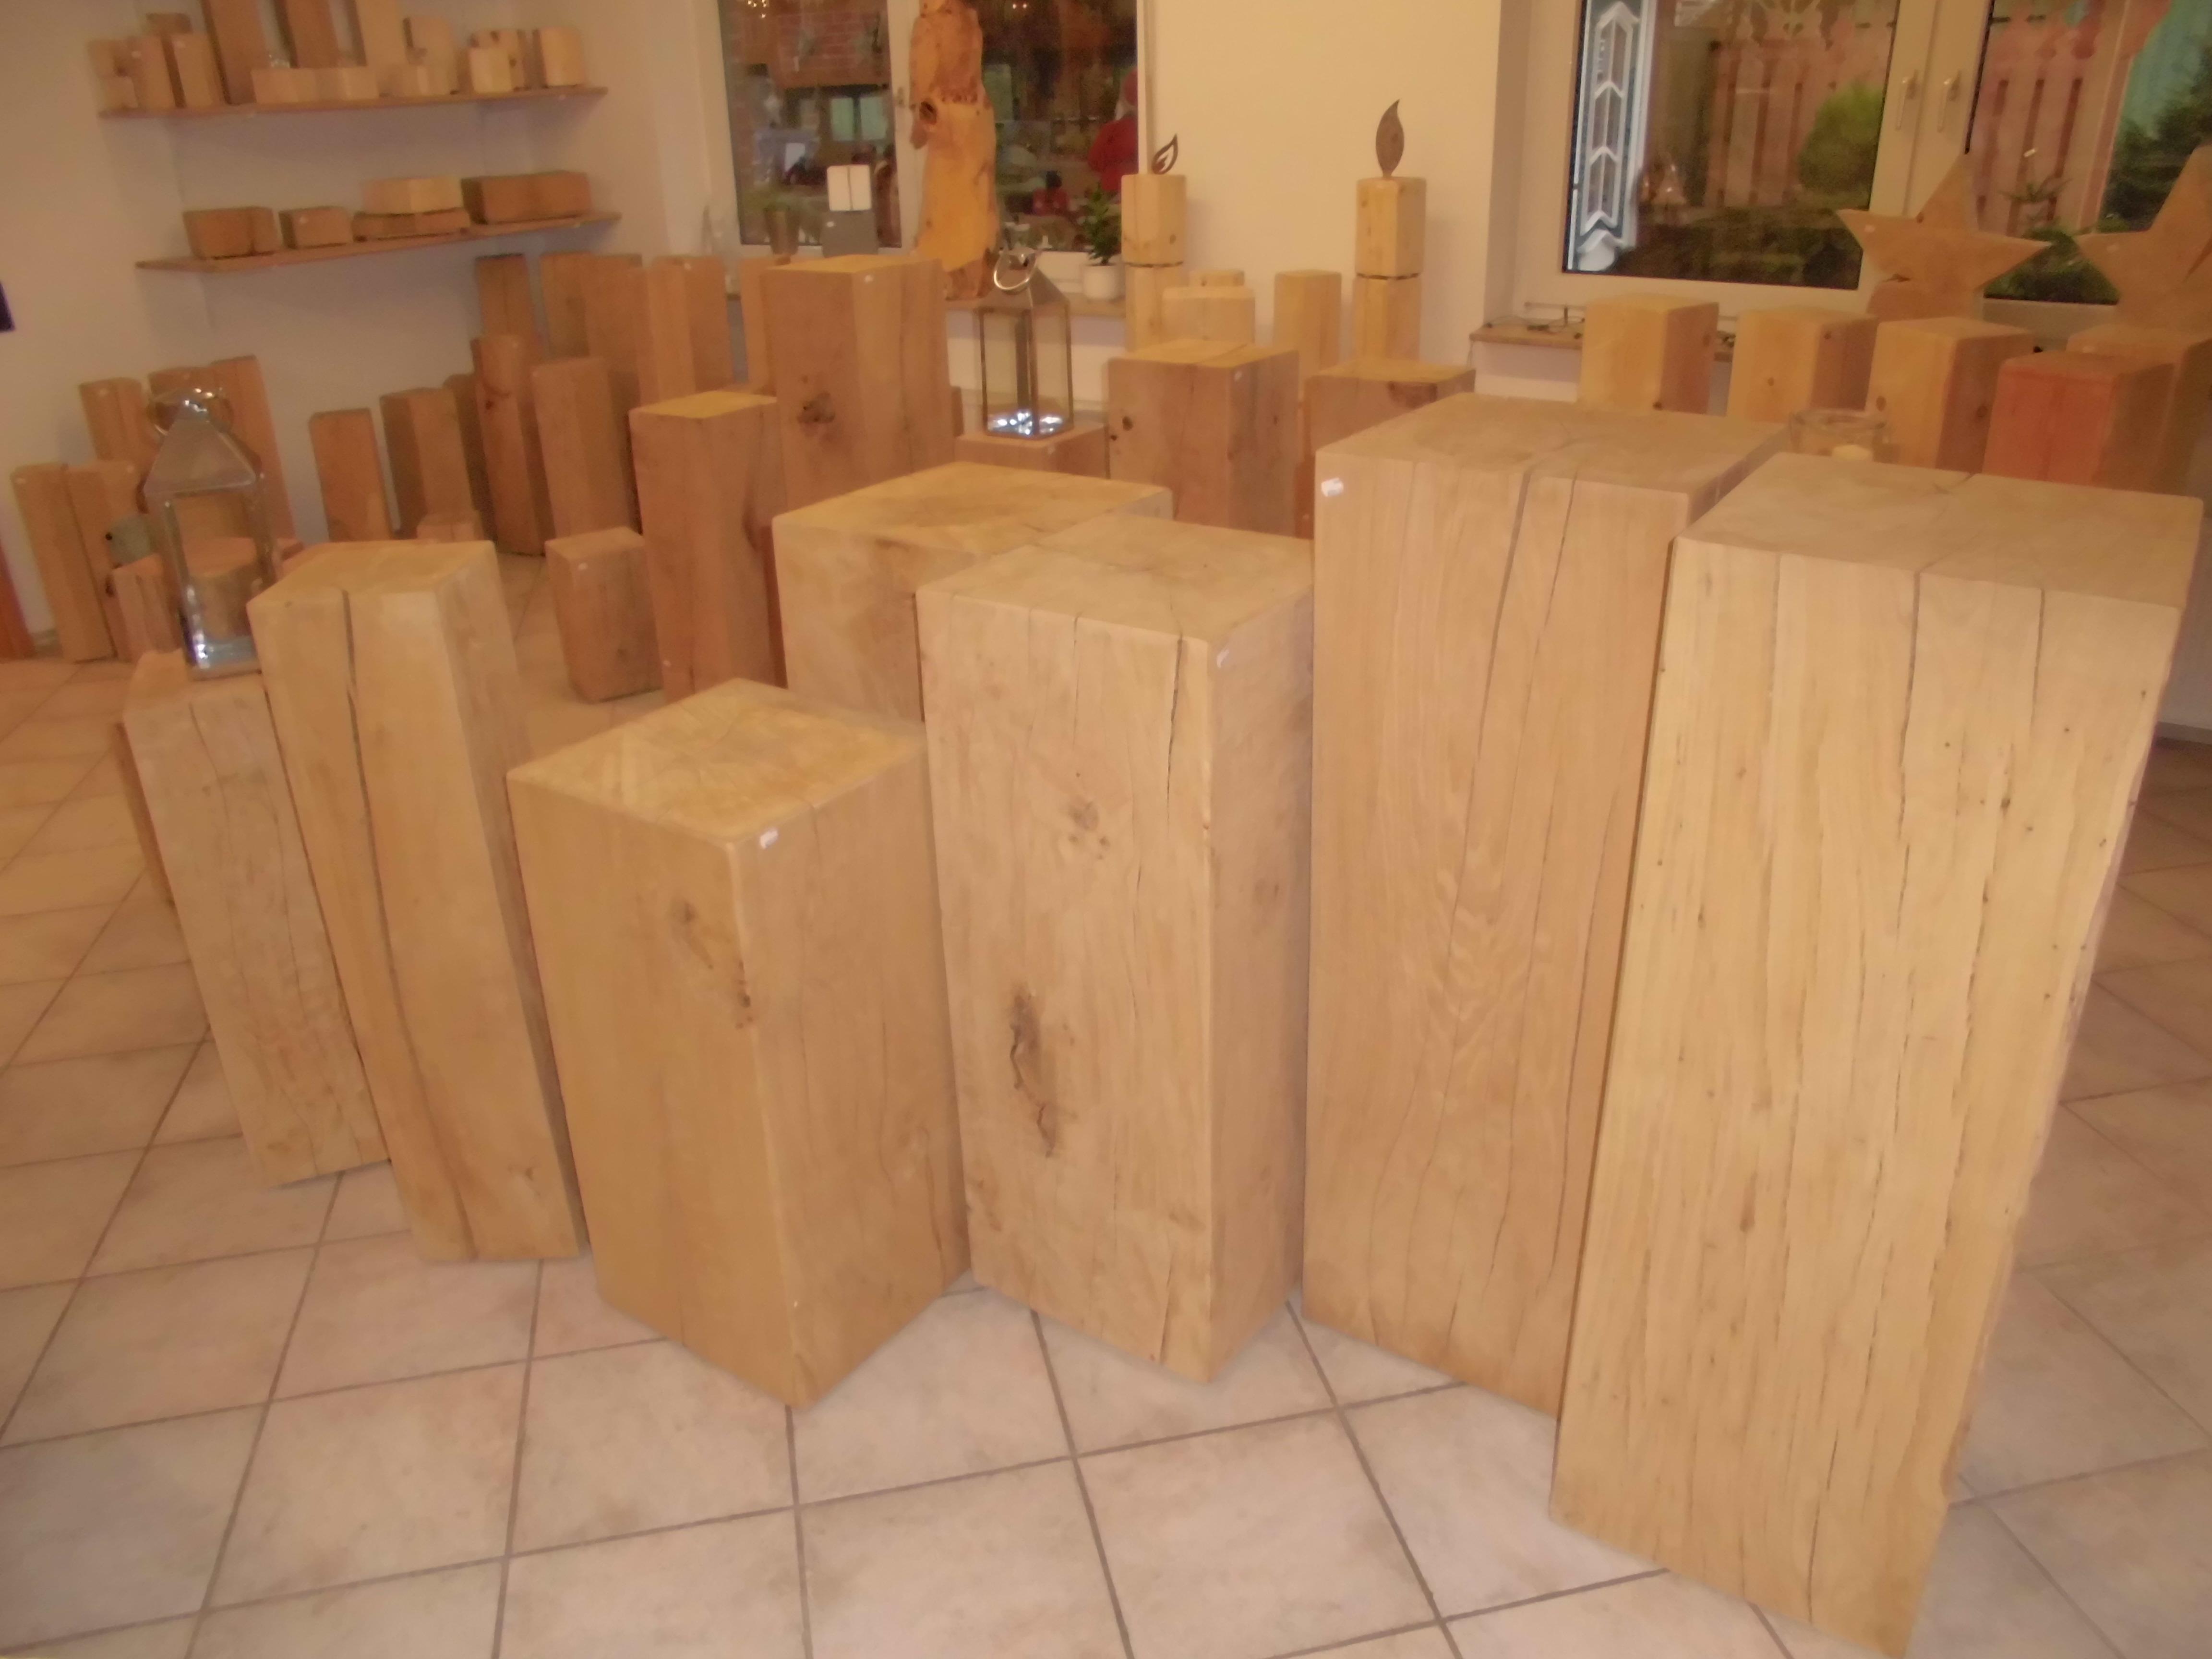 Eichenholzsäule gehobelt, geschliffen, angefast 25x25x80cm